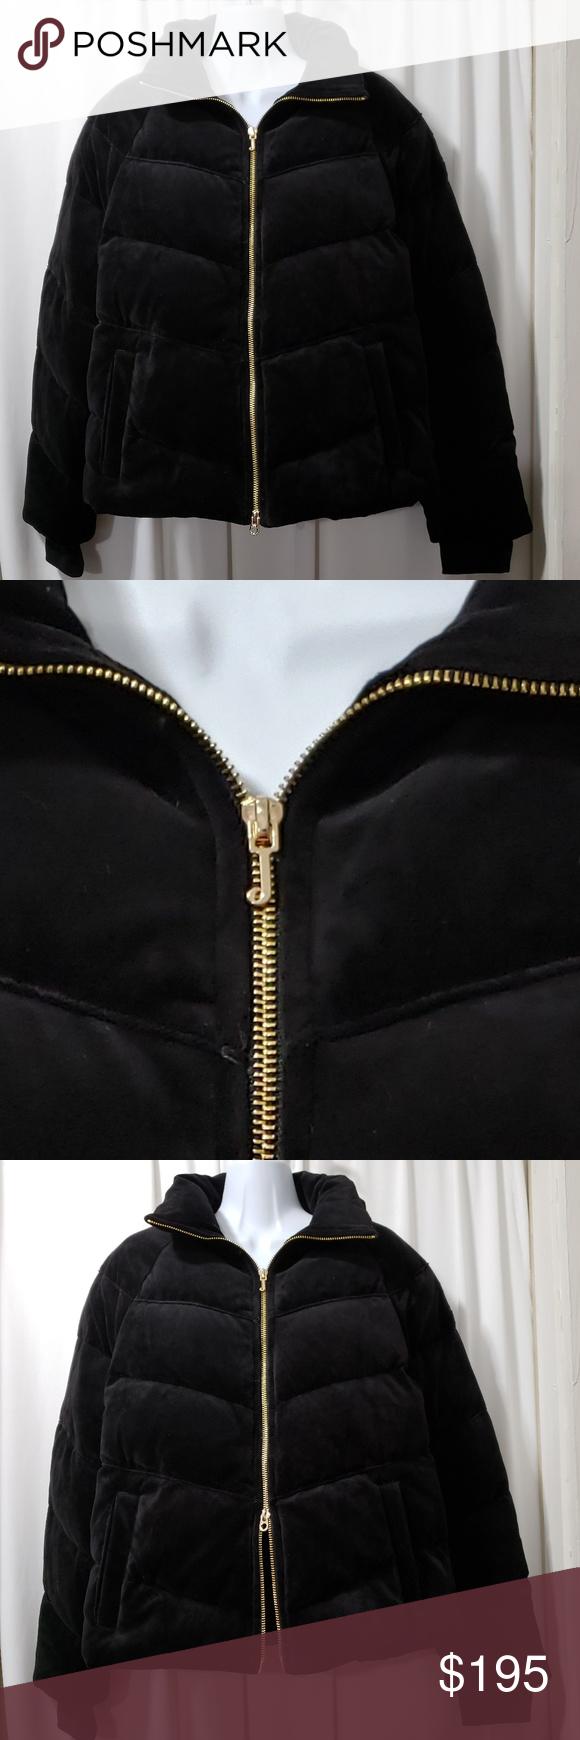 Juicy Couture Black Velvet Puffer Jacket Juicy Couture Jacket Stylish Winter Coats Juicy Couture [ 1740 x 580 Pixel ]